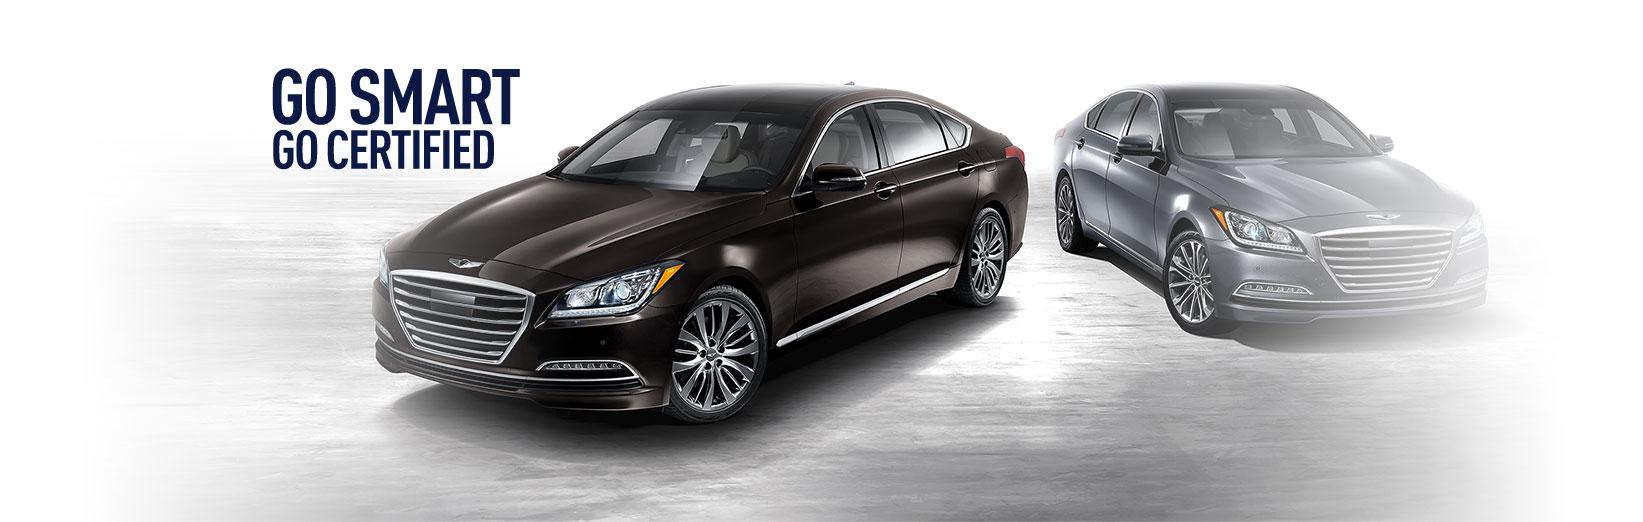 New Hyundai  Exterior image 2